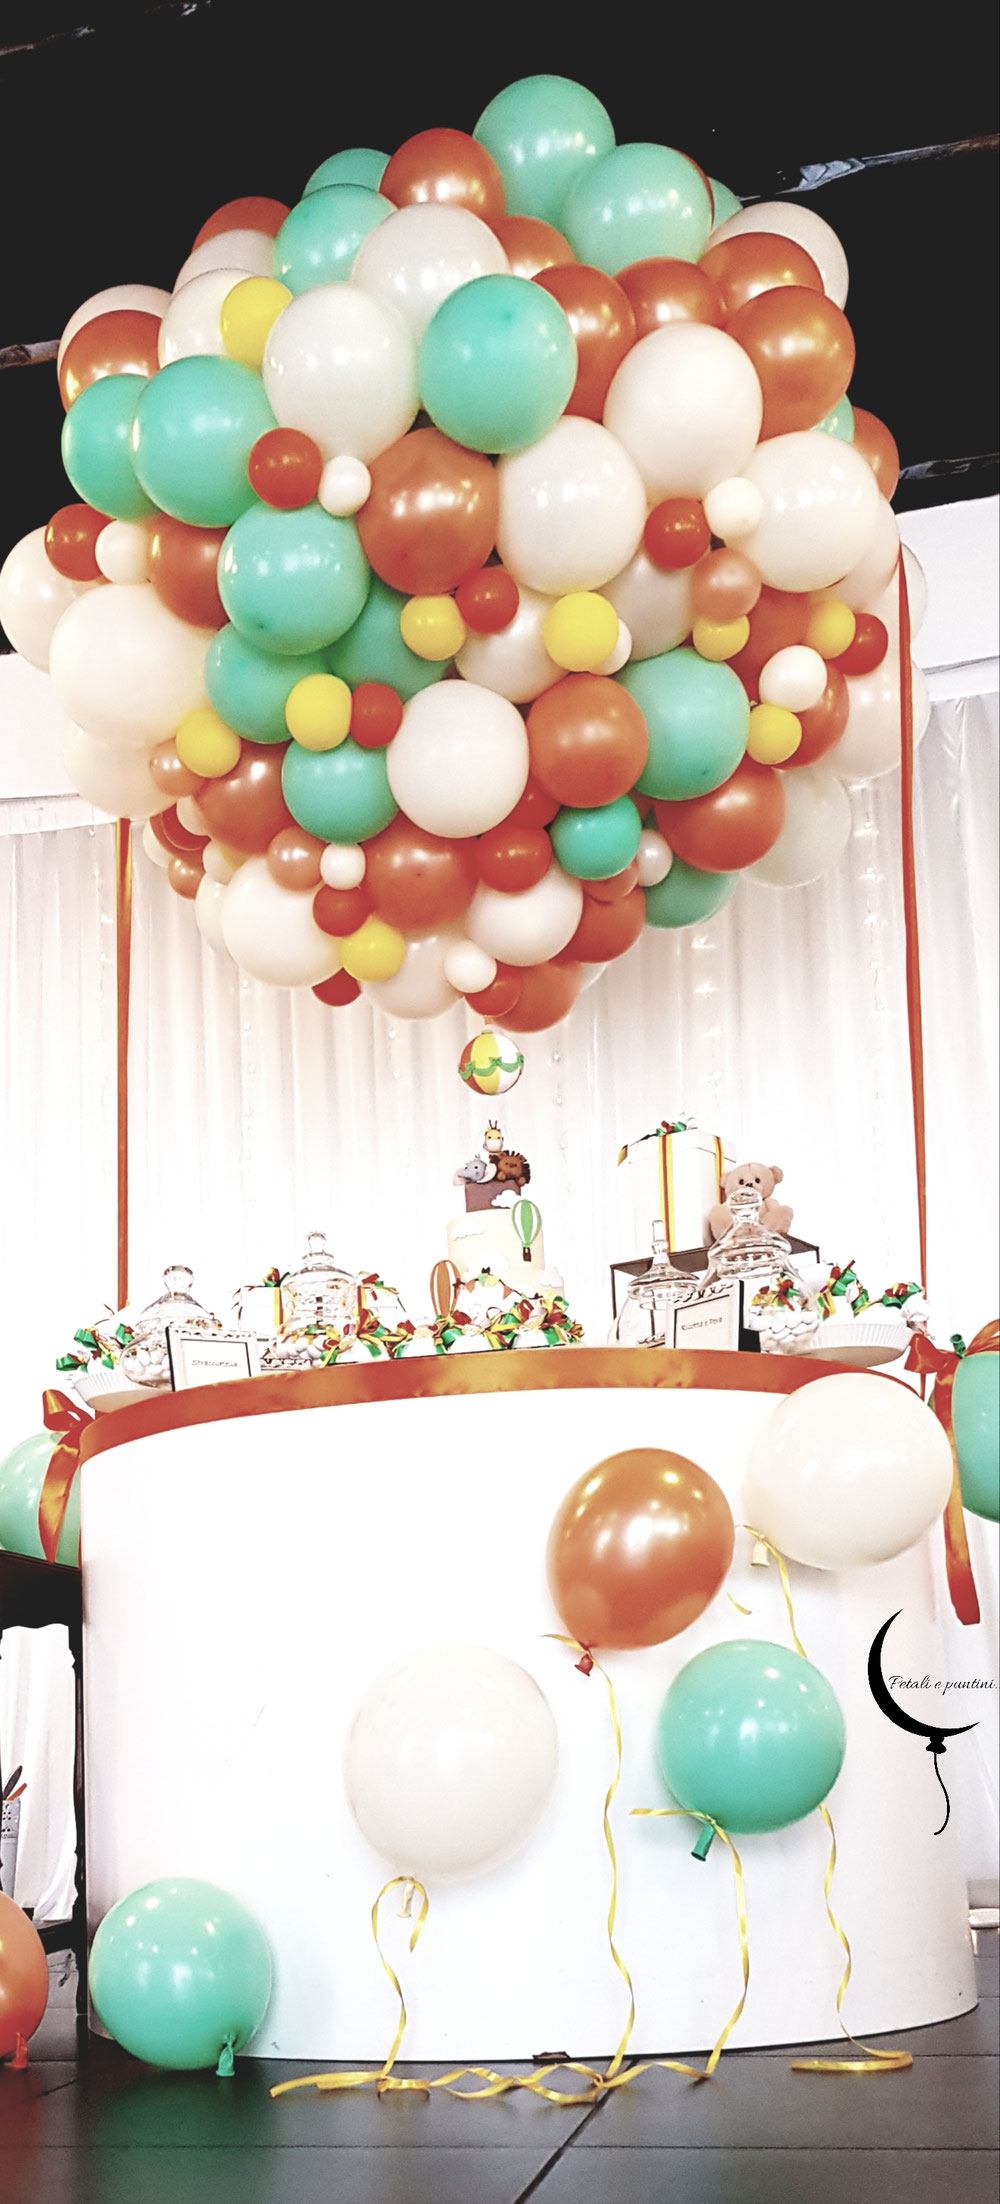 Mongolfiera con palloncini